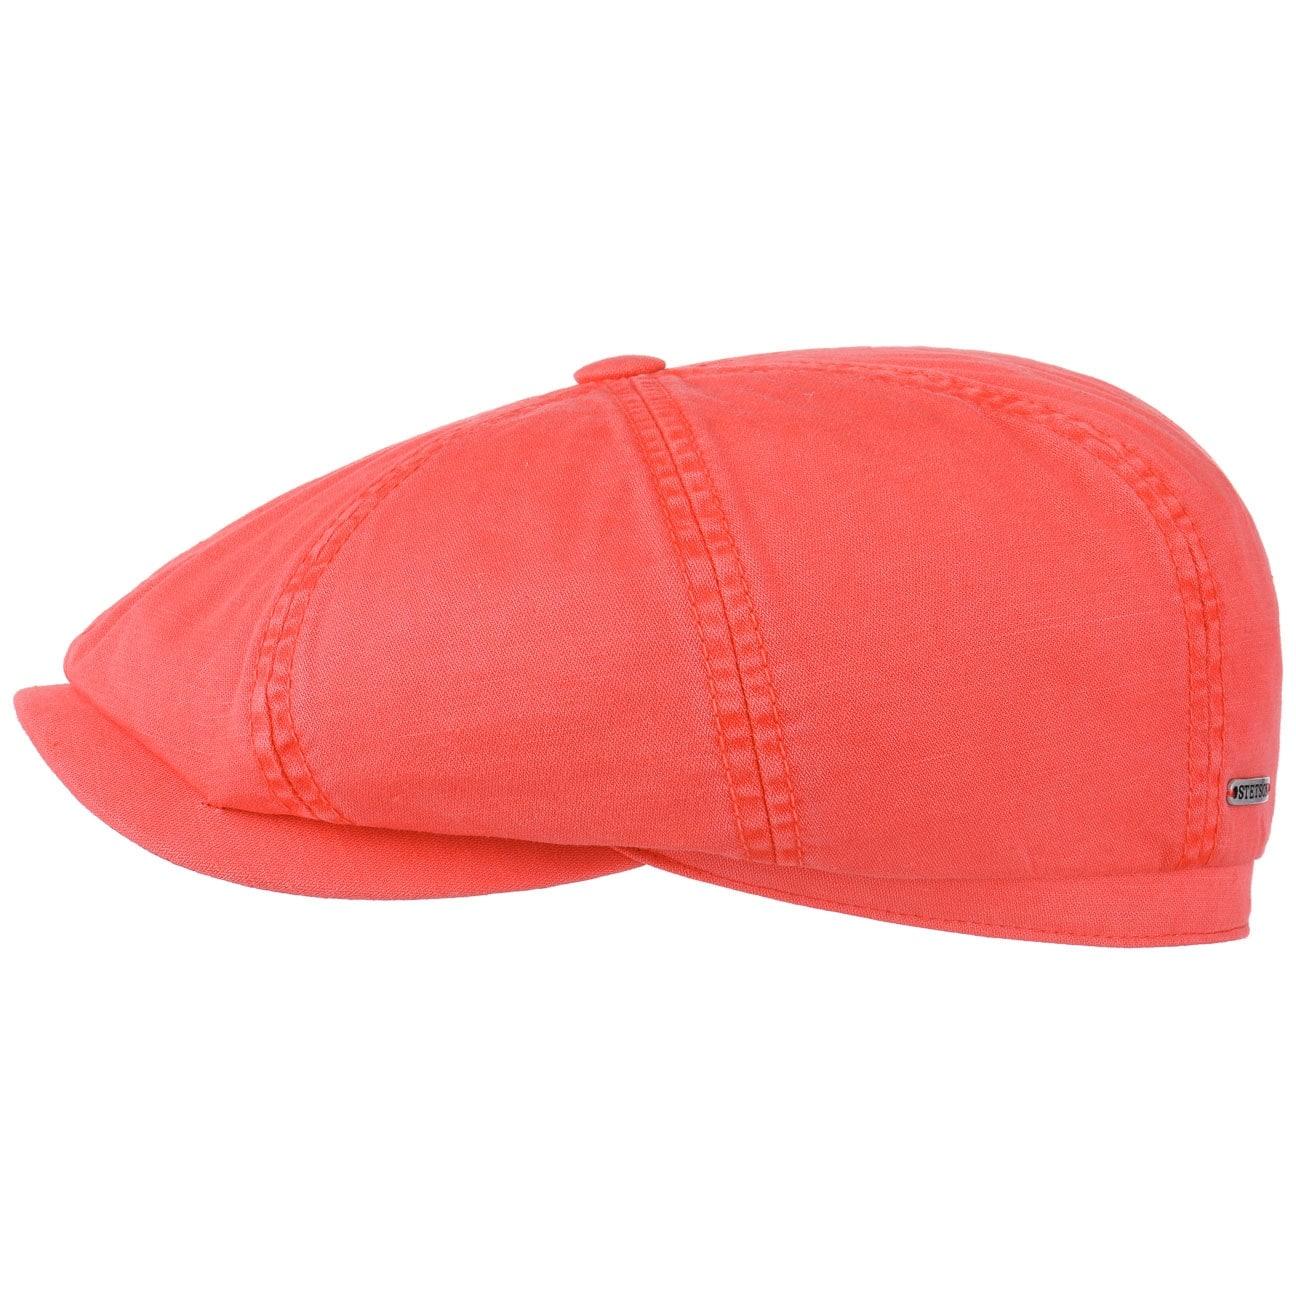 hatteras-dye-flatcap-by-stetson-schiebermutze